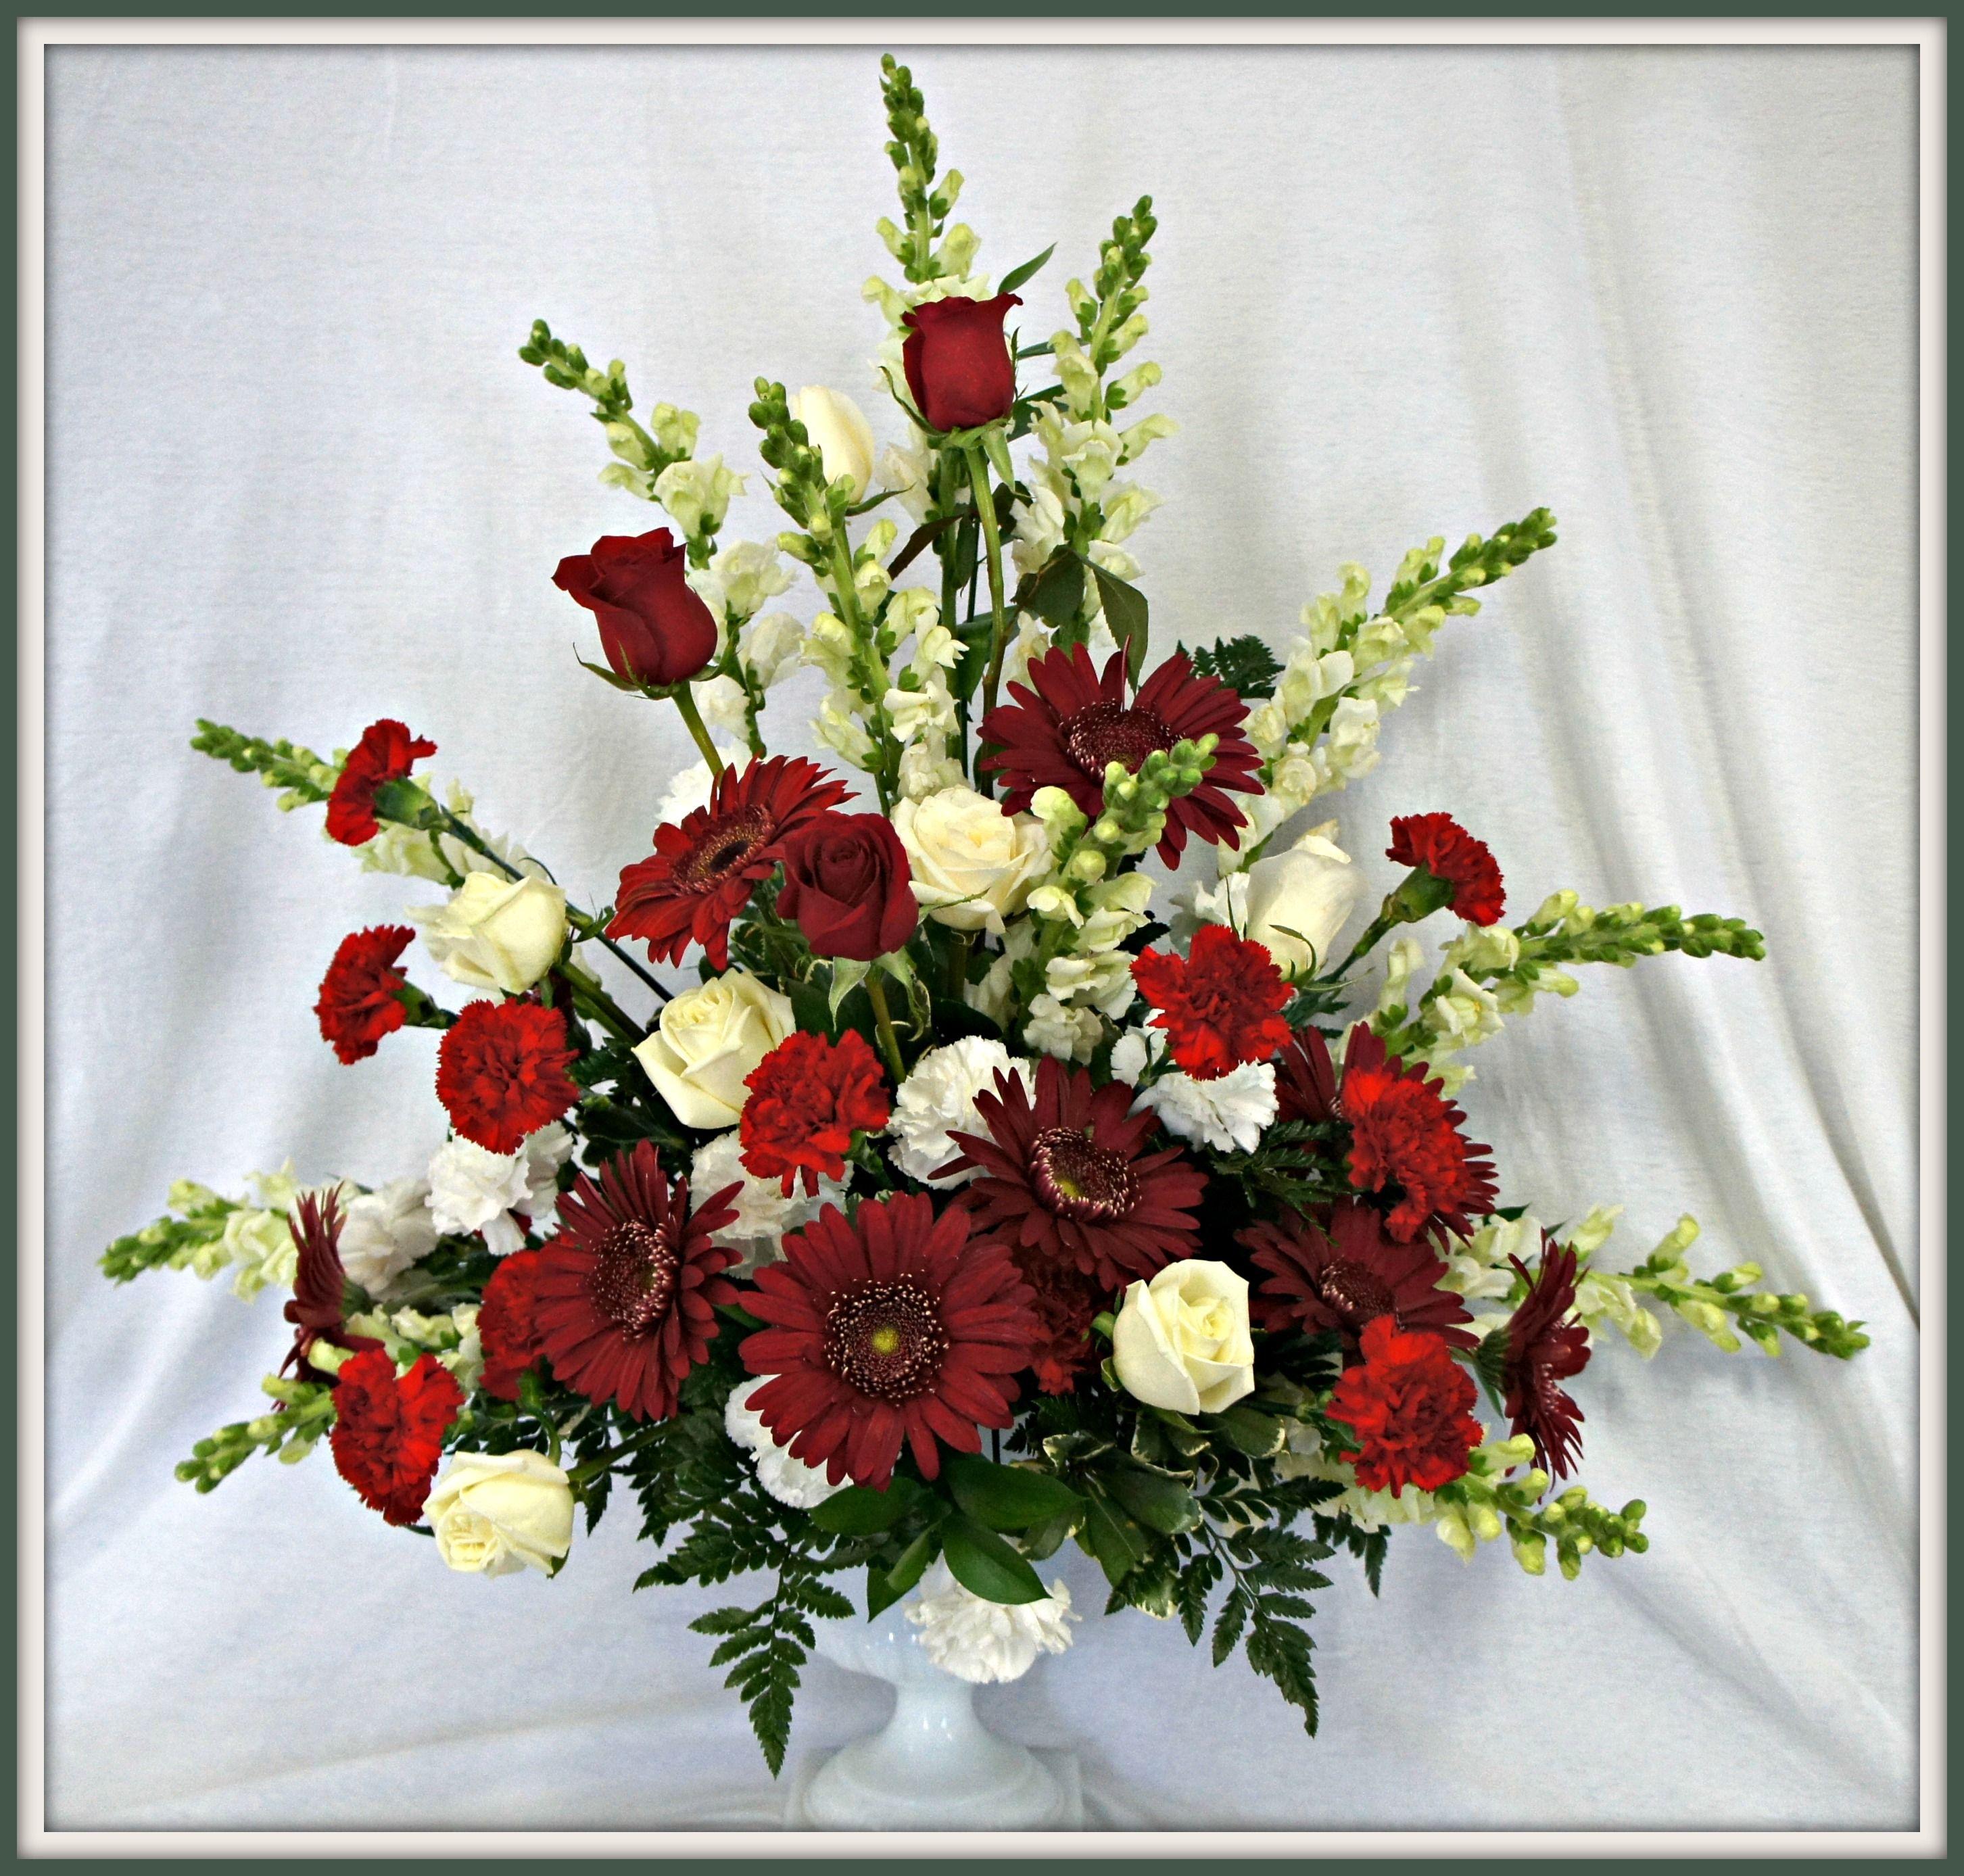 Beautiful Flower Arrangements For Weddings: Beautiful Red And White Pedestal Arrangement